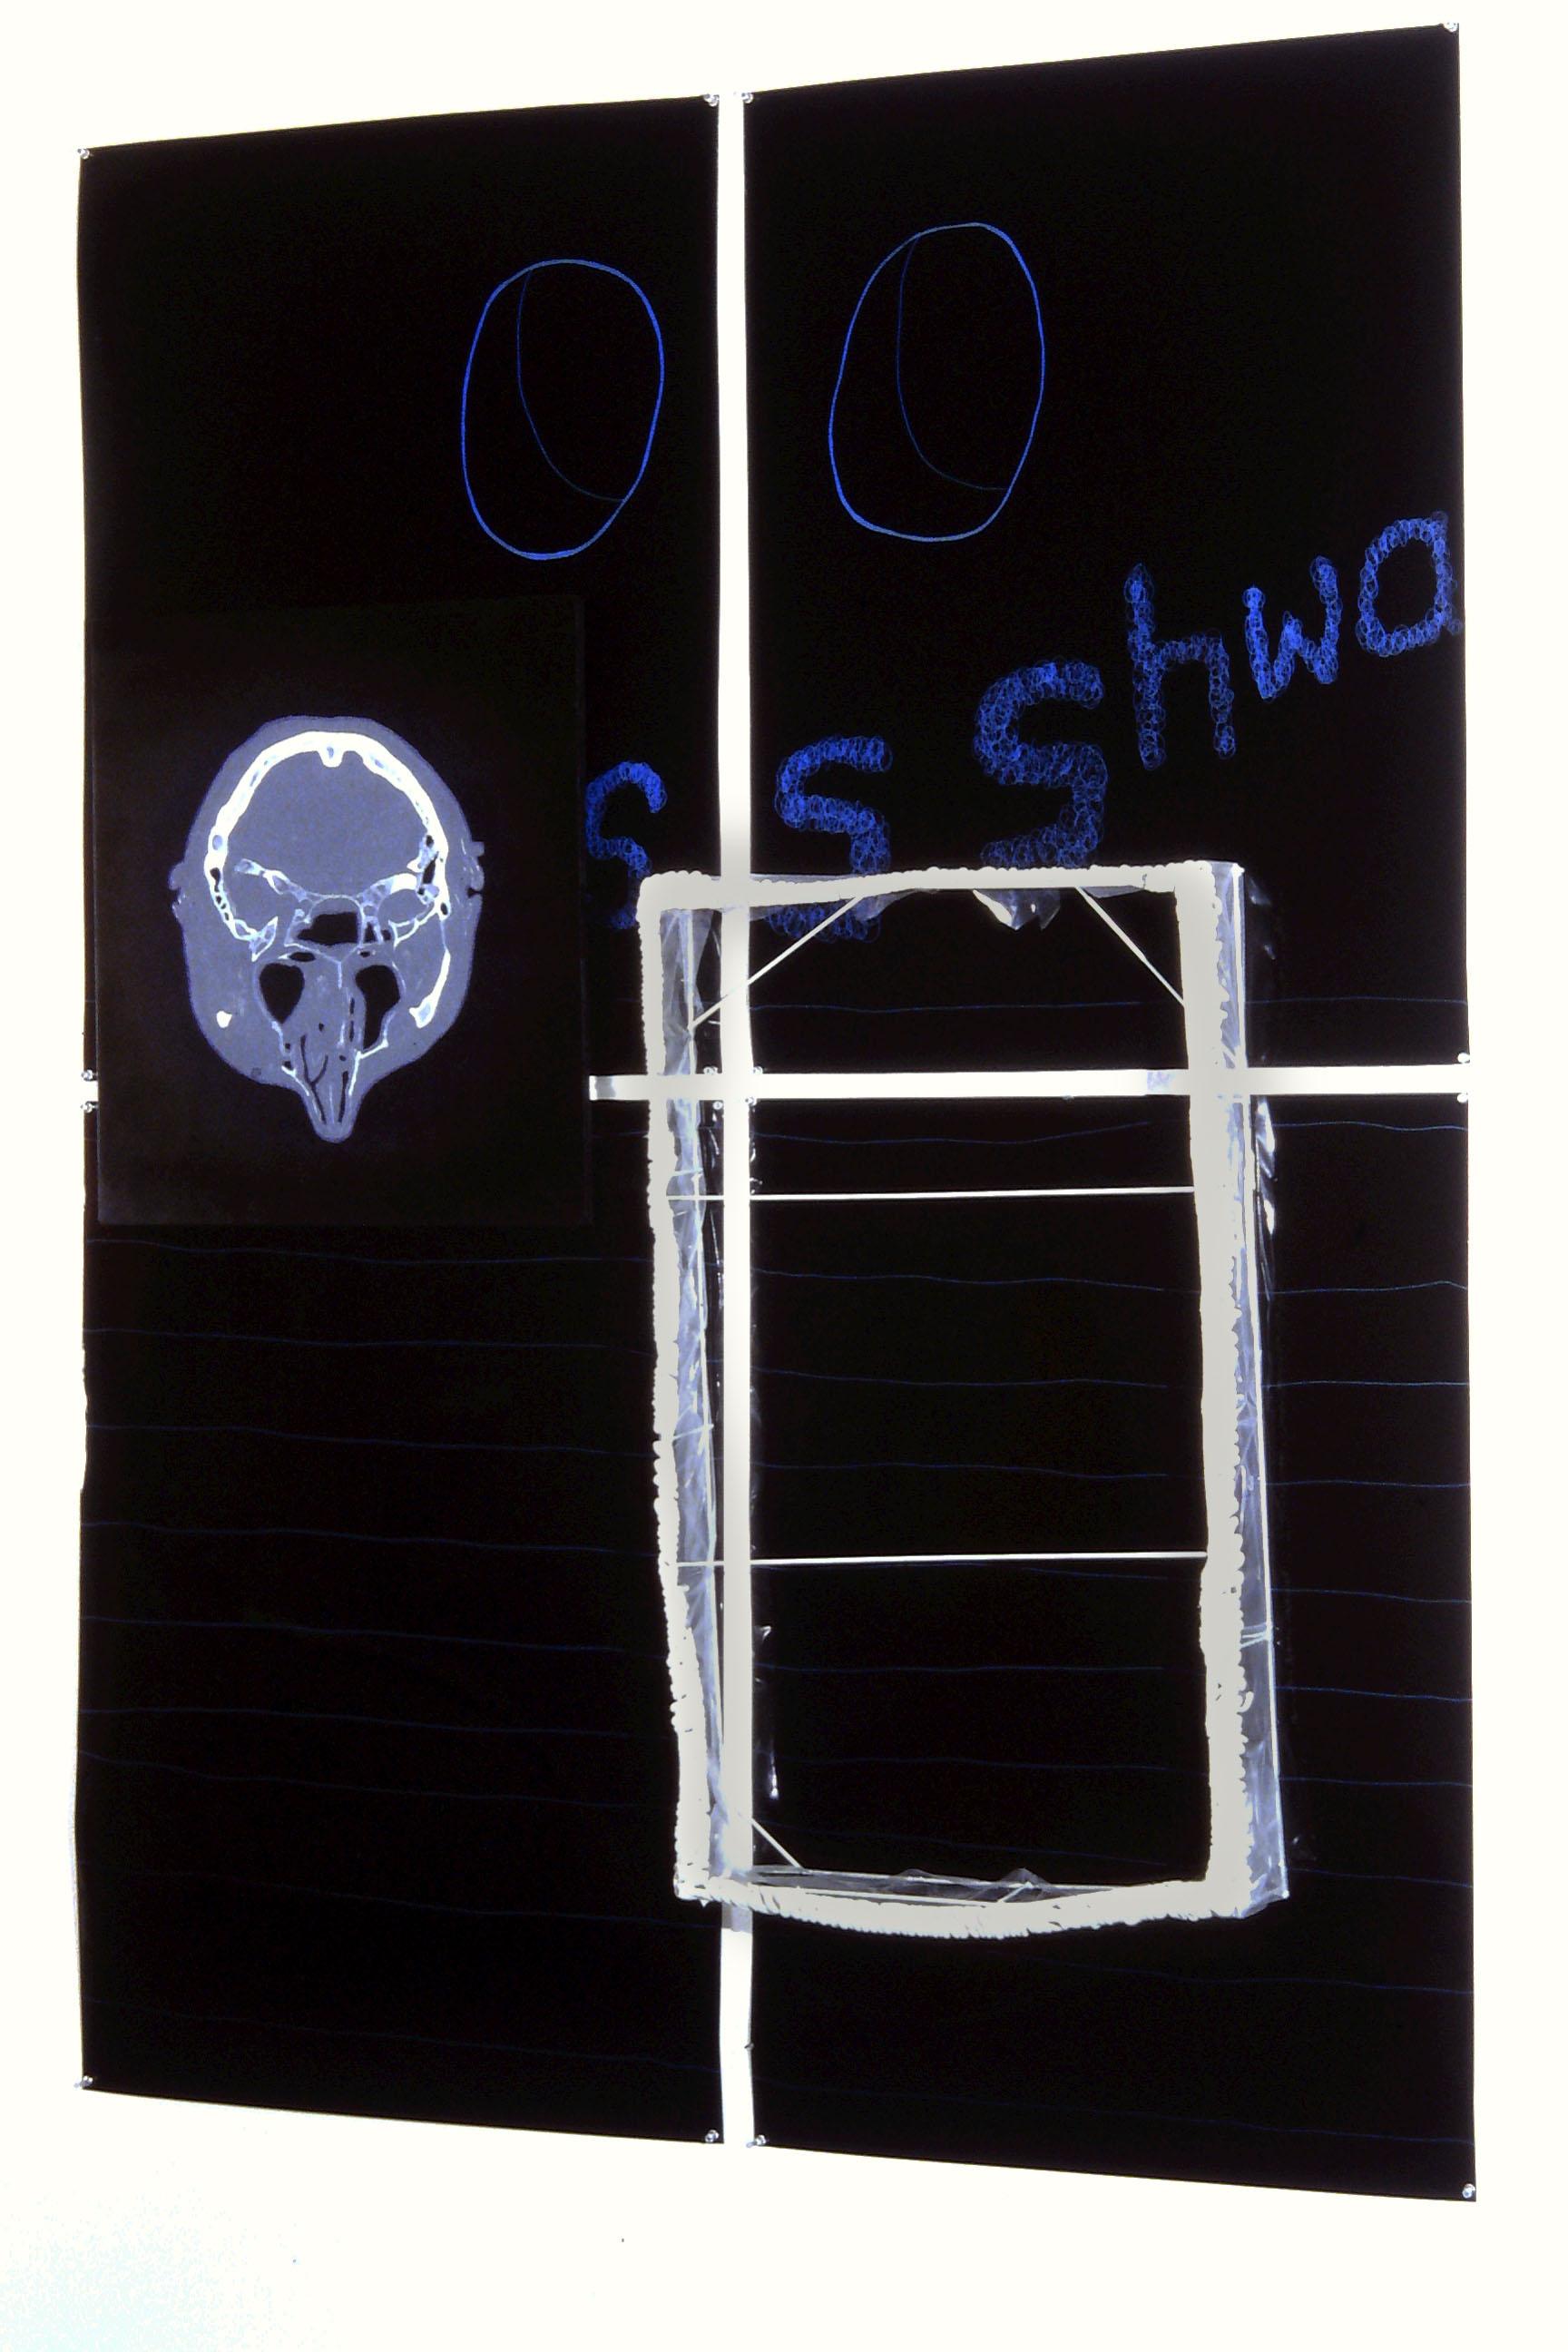 Peter_Alwast_insideout_2001.jpg